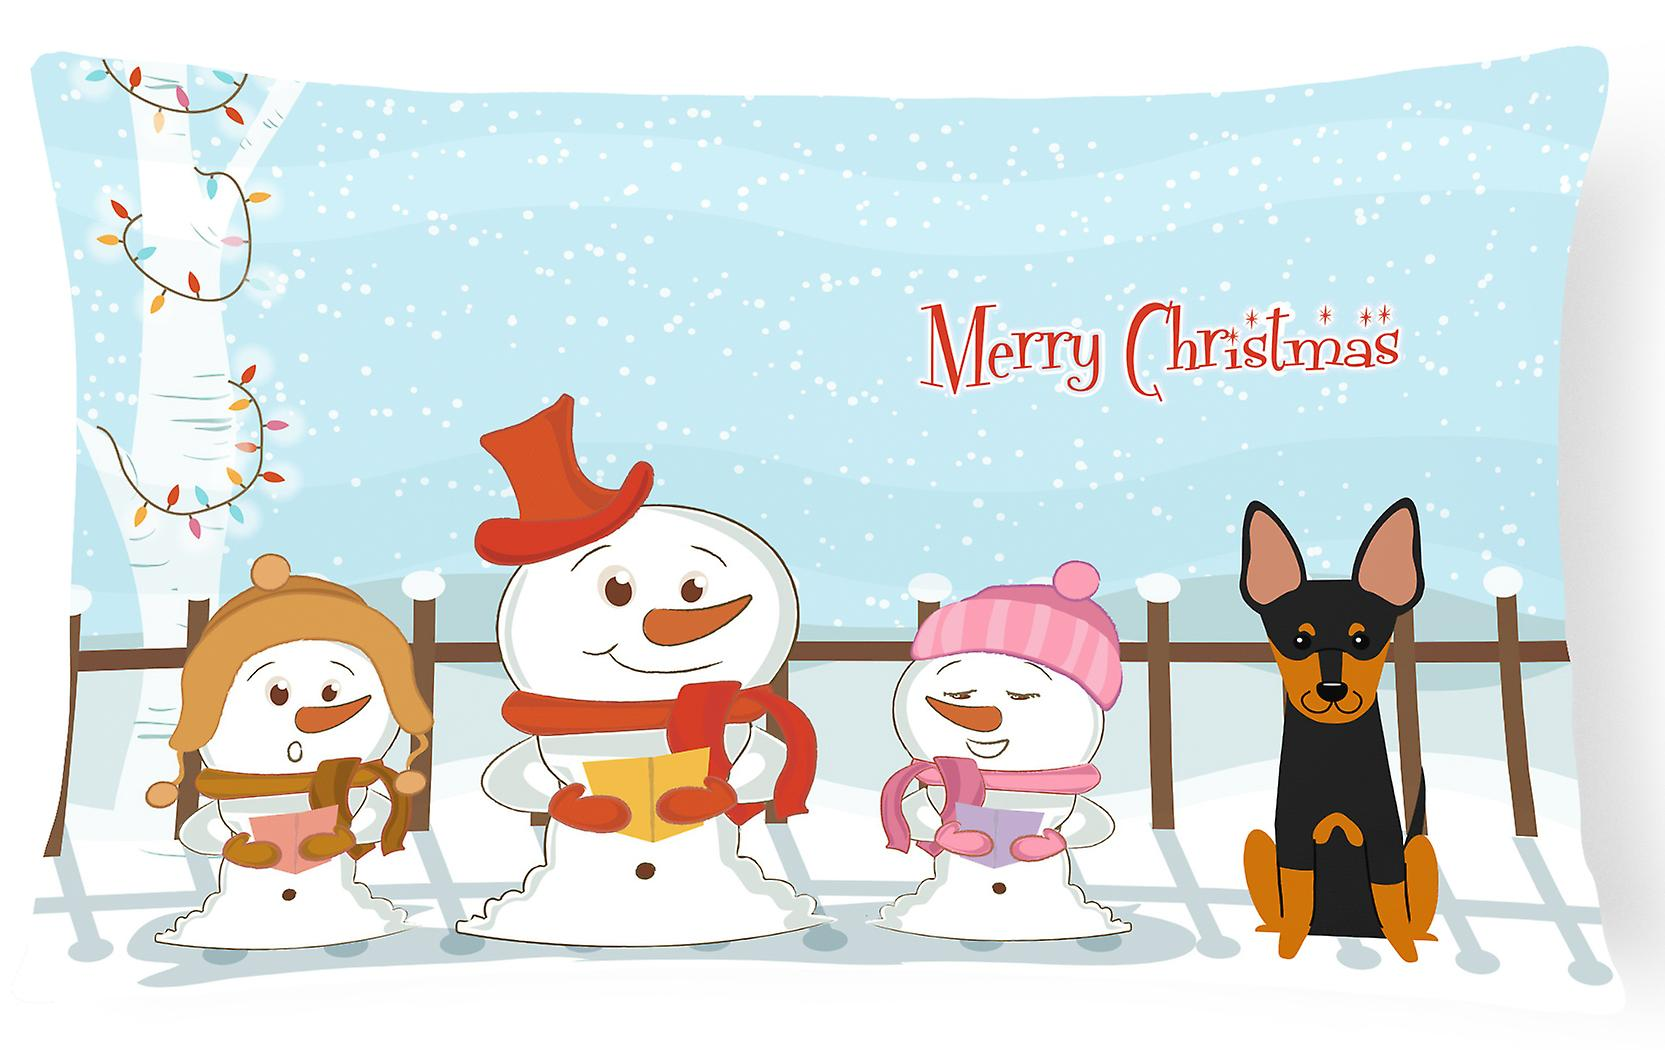 Chanteurs Oreiller Anglais Toile Terrier Toy Tissu Décoratif Joyeux Noël bfgyY76